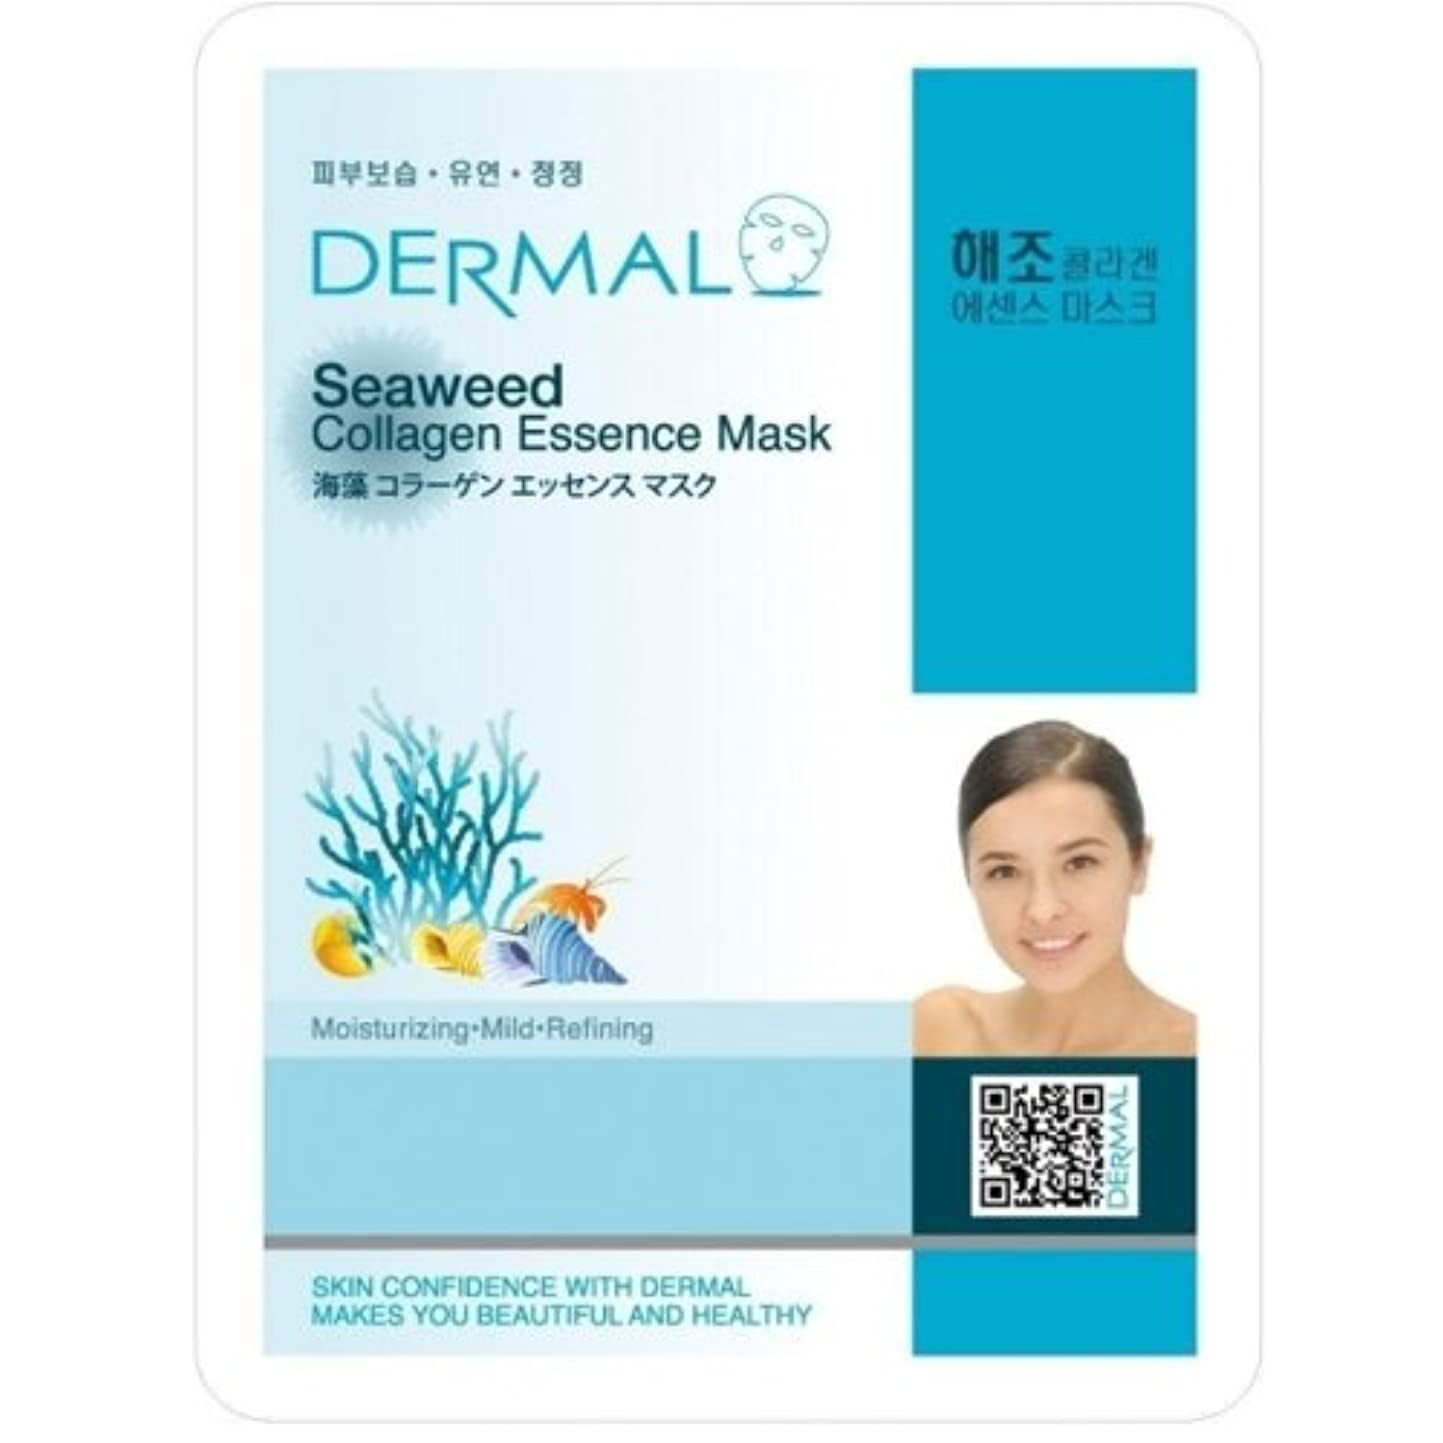 【DERMAL】ダーマル シートマスク 海藻 10枚セット/保湿/フェイスマスク/フェイスパック/マスクパック/韓国コスメ [メール便]